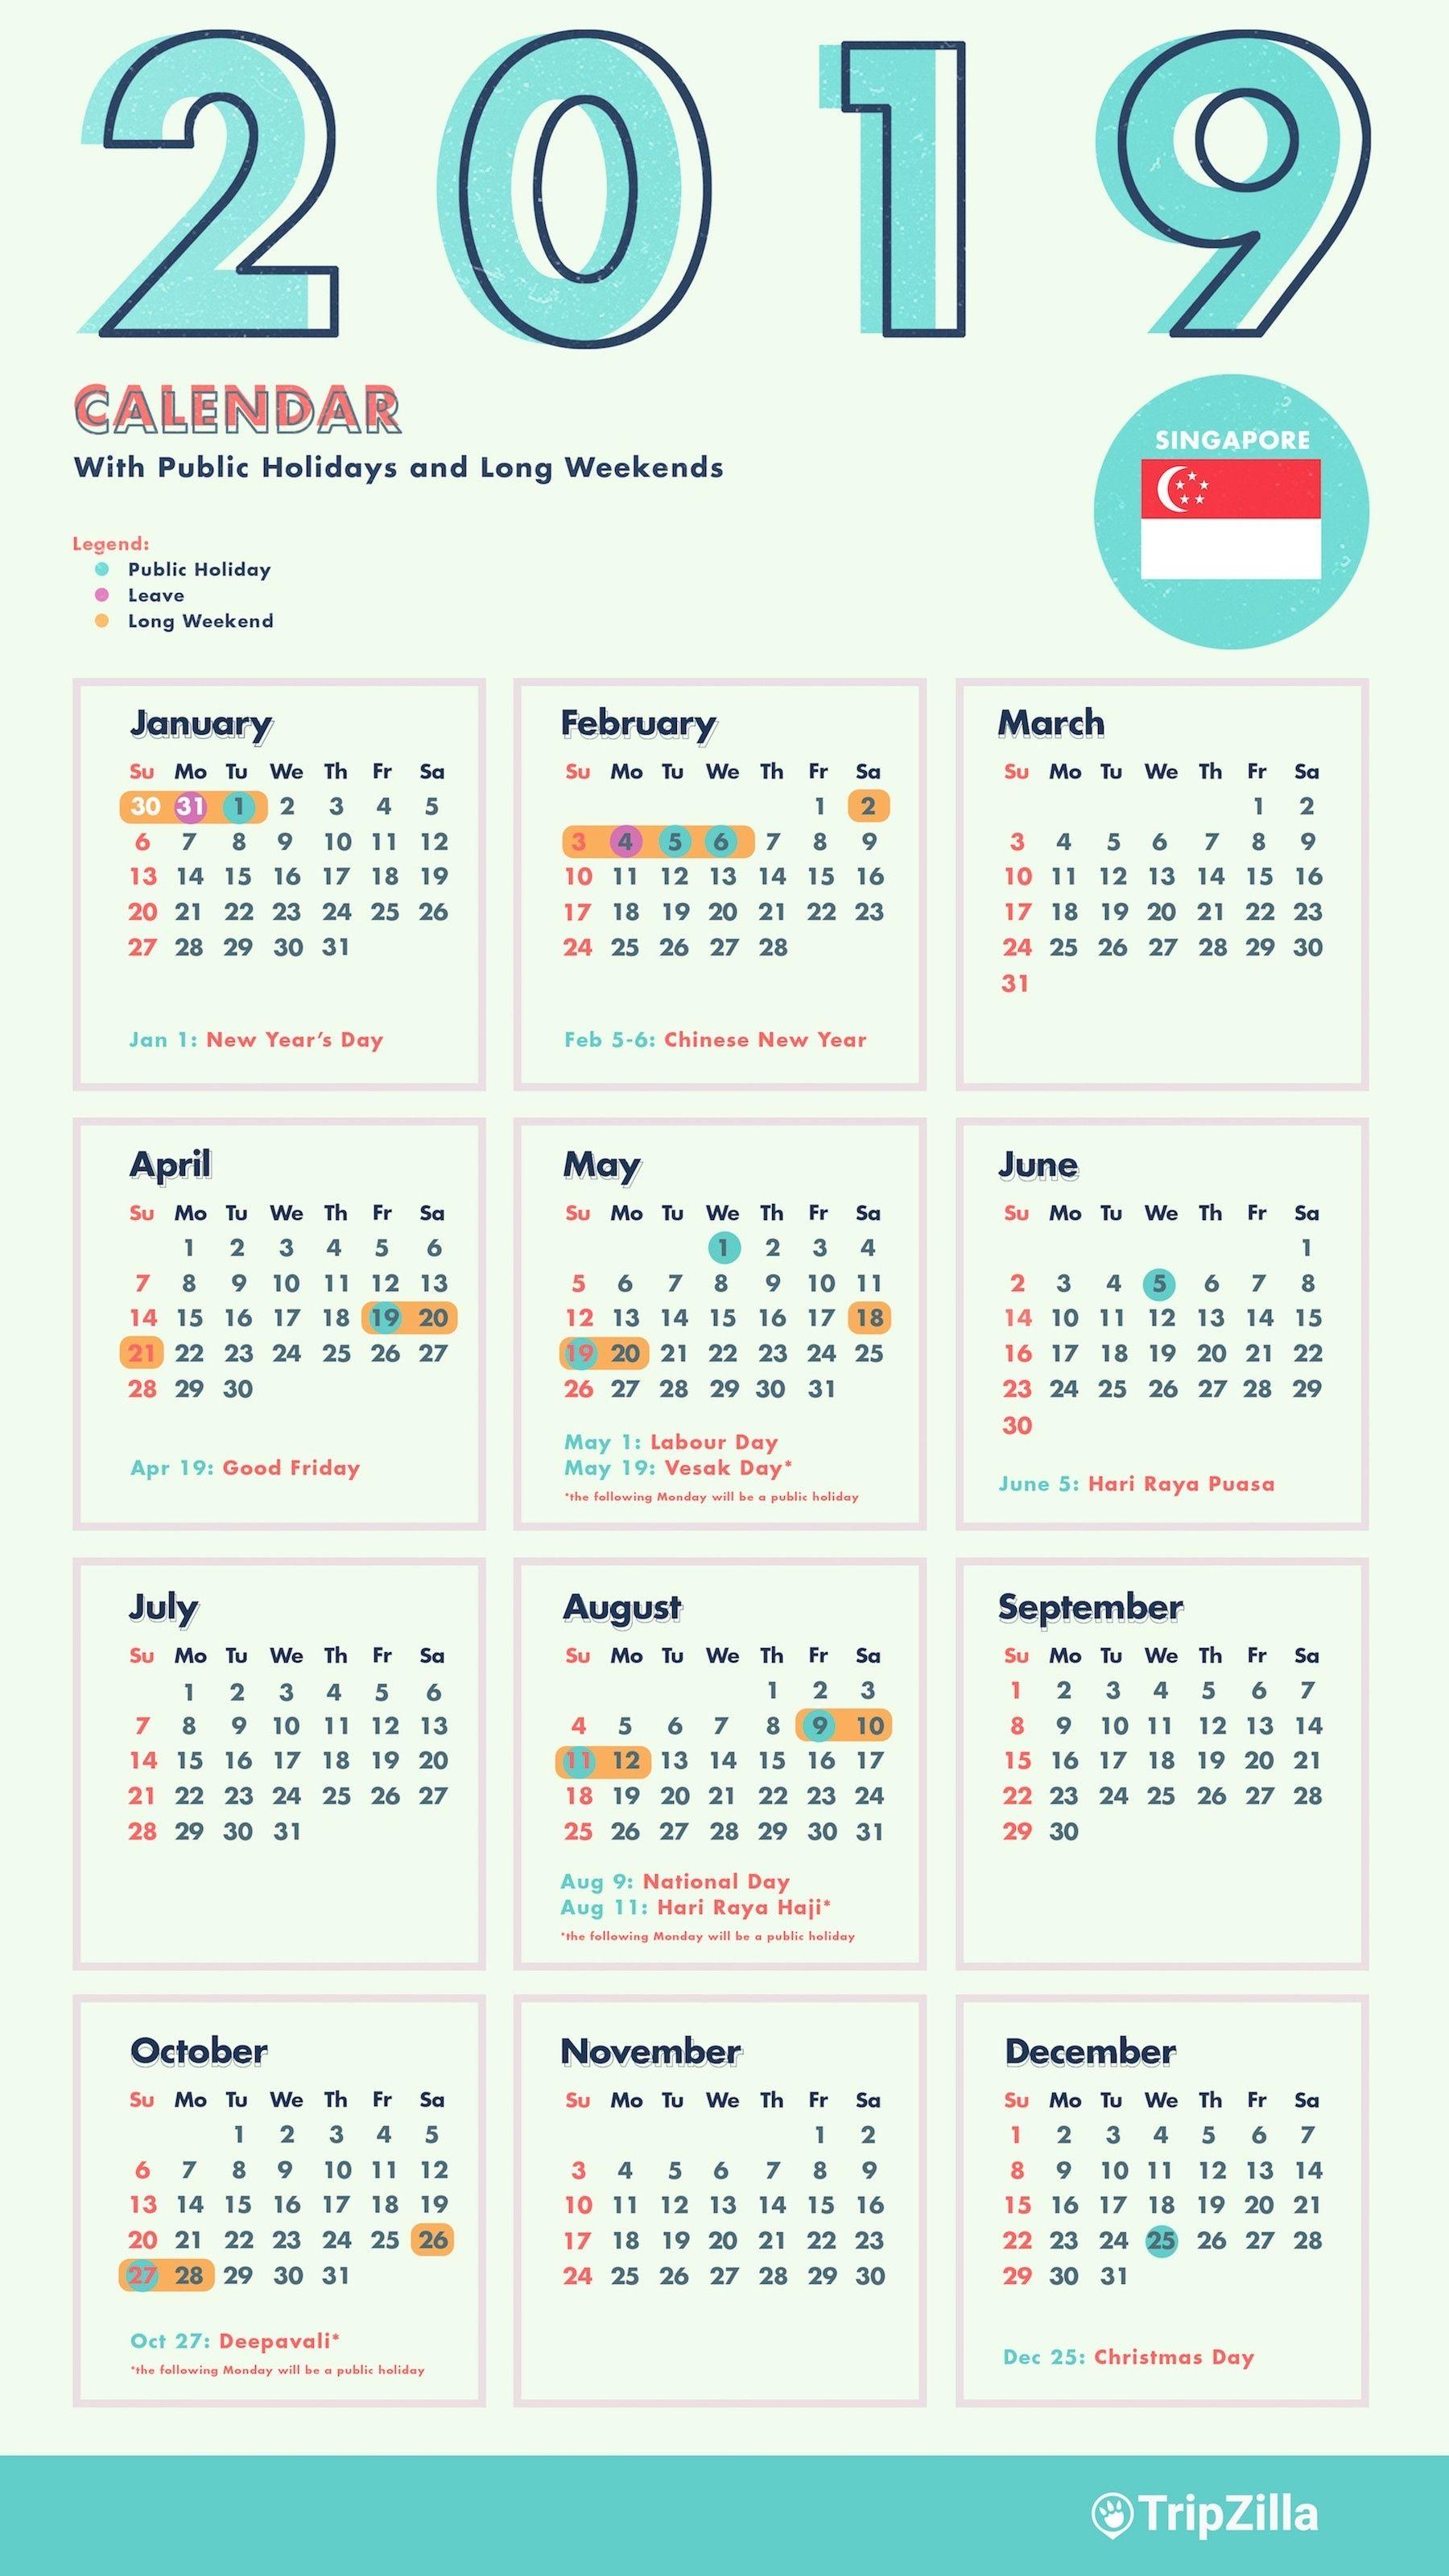 Chinese New Year 2019 Dates